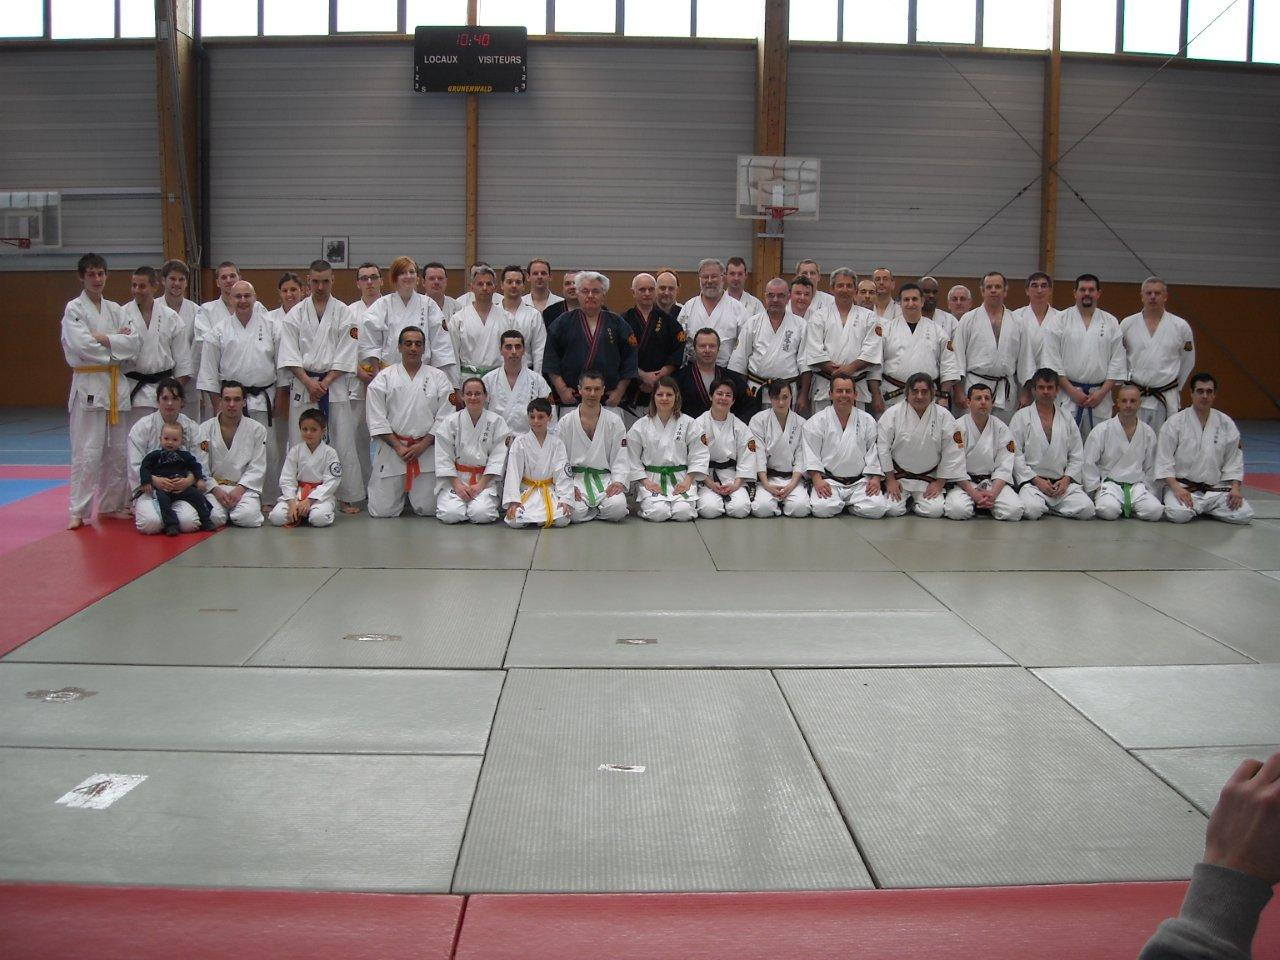 Francia (Le Blanc) 2010 - 1